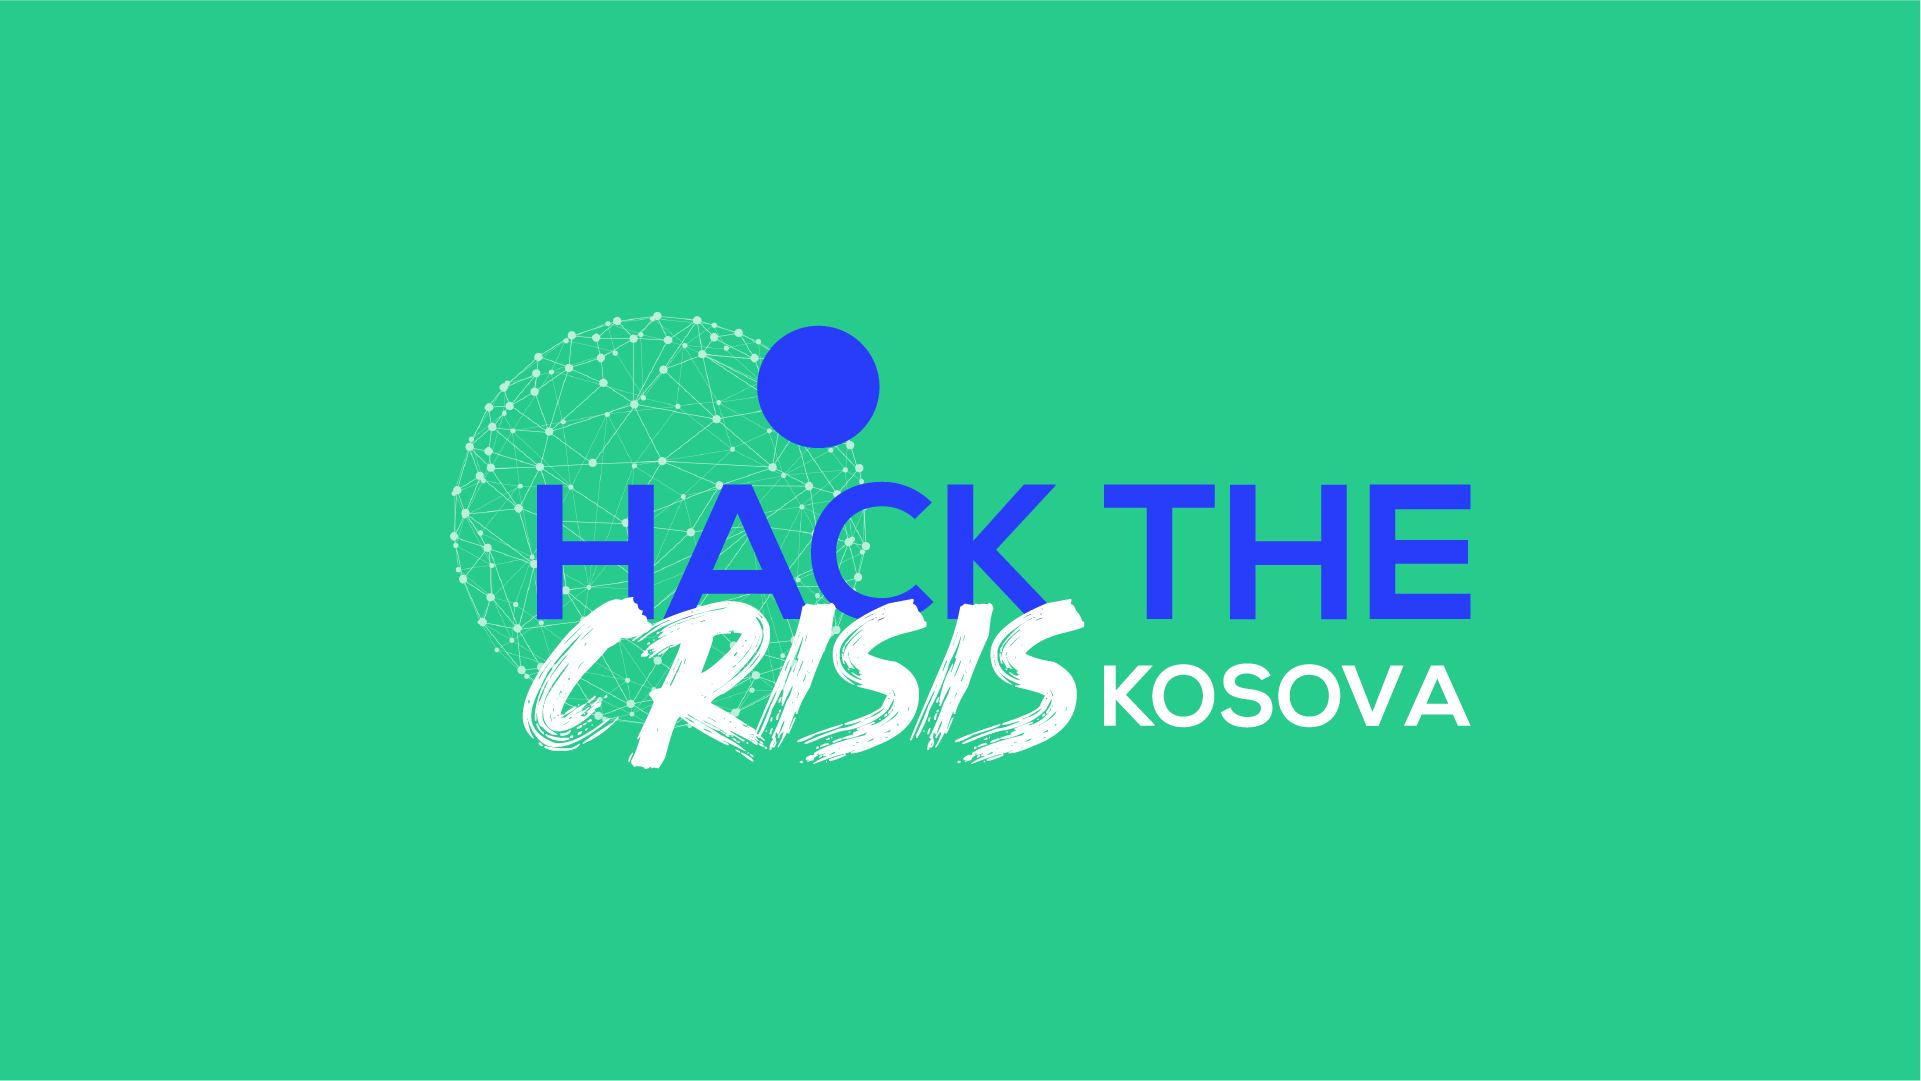 Hack the Crisis Kosova